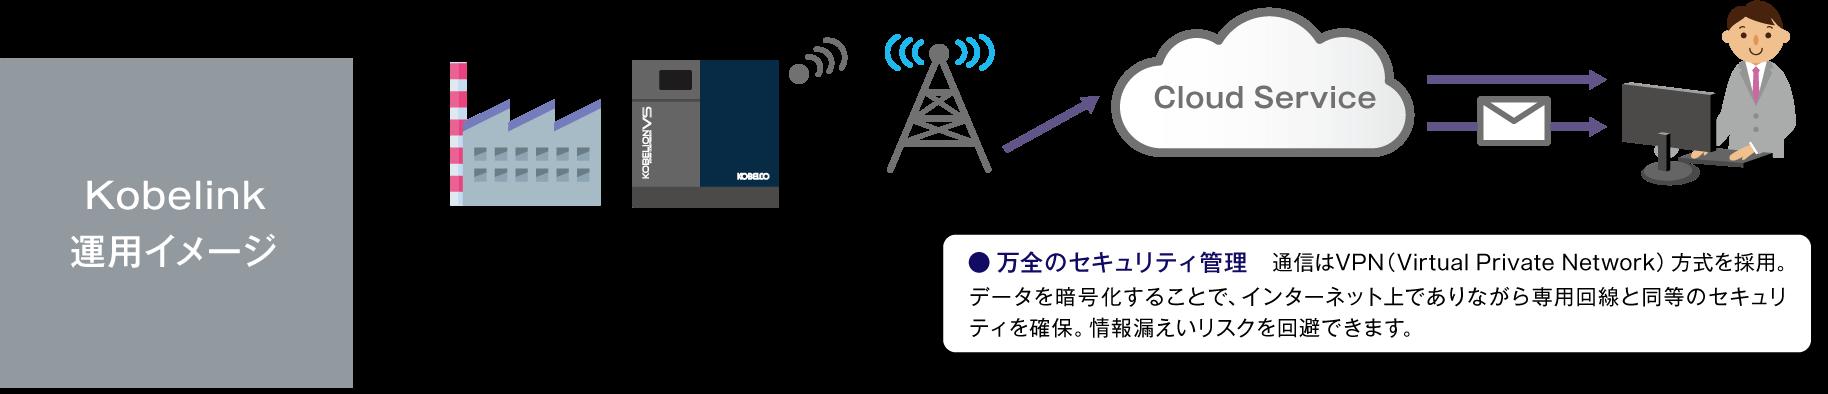 Kobelink運用イメージ画像